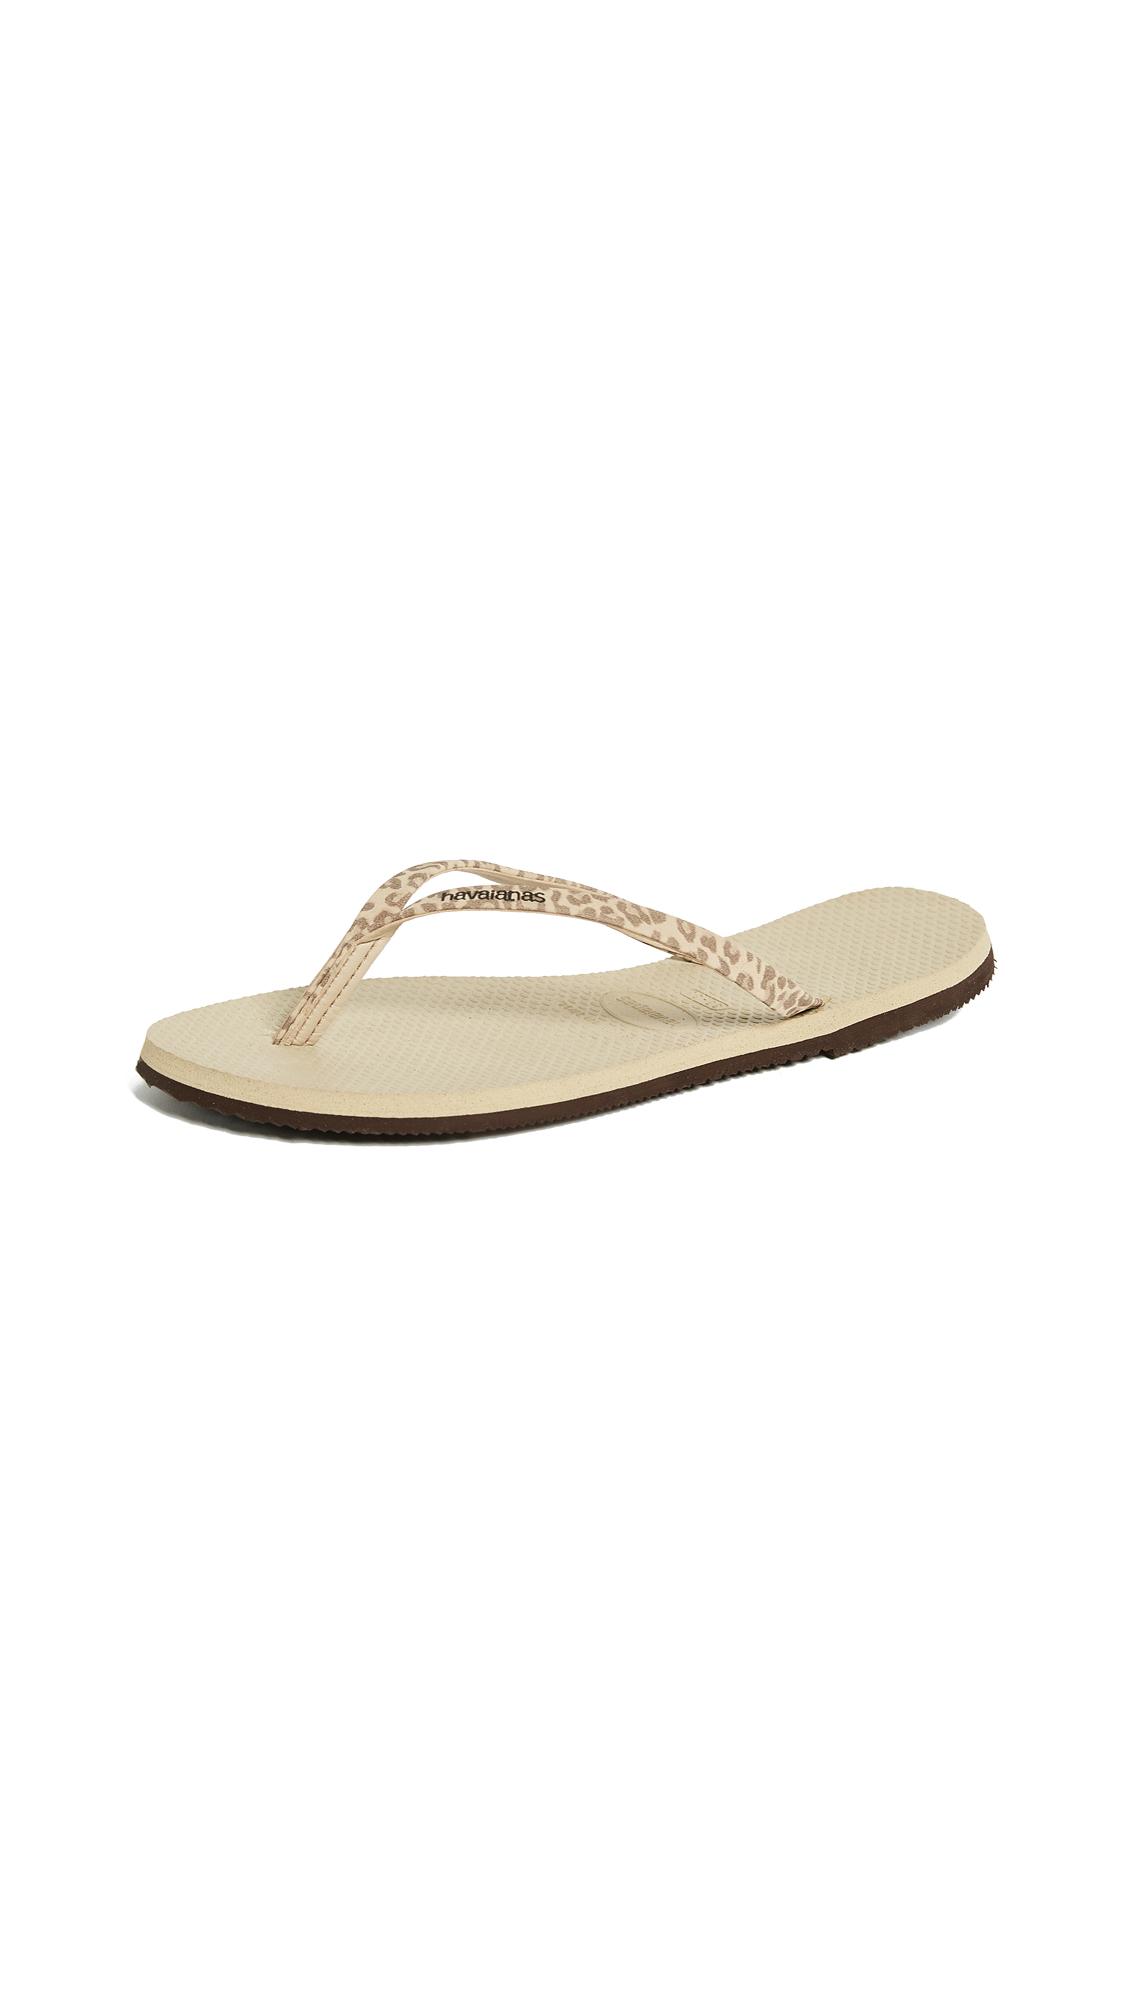 Havaianas You Animals Flip Flops - Sand Grey